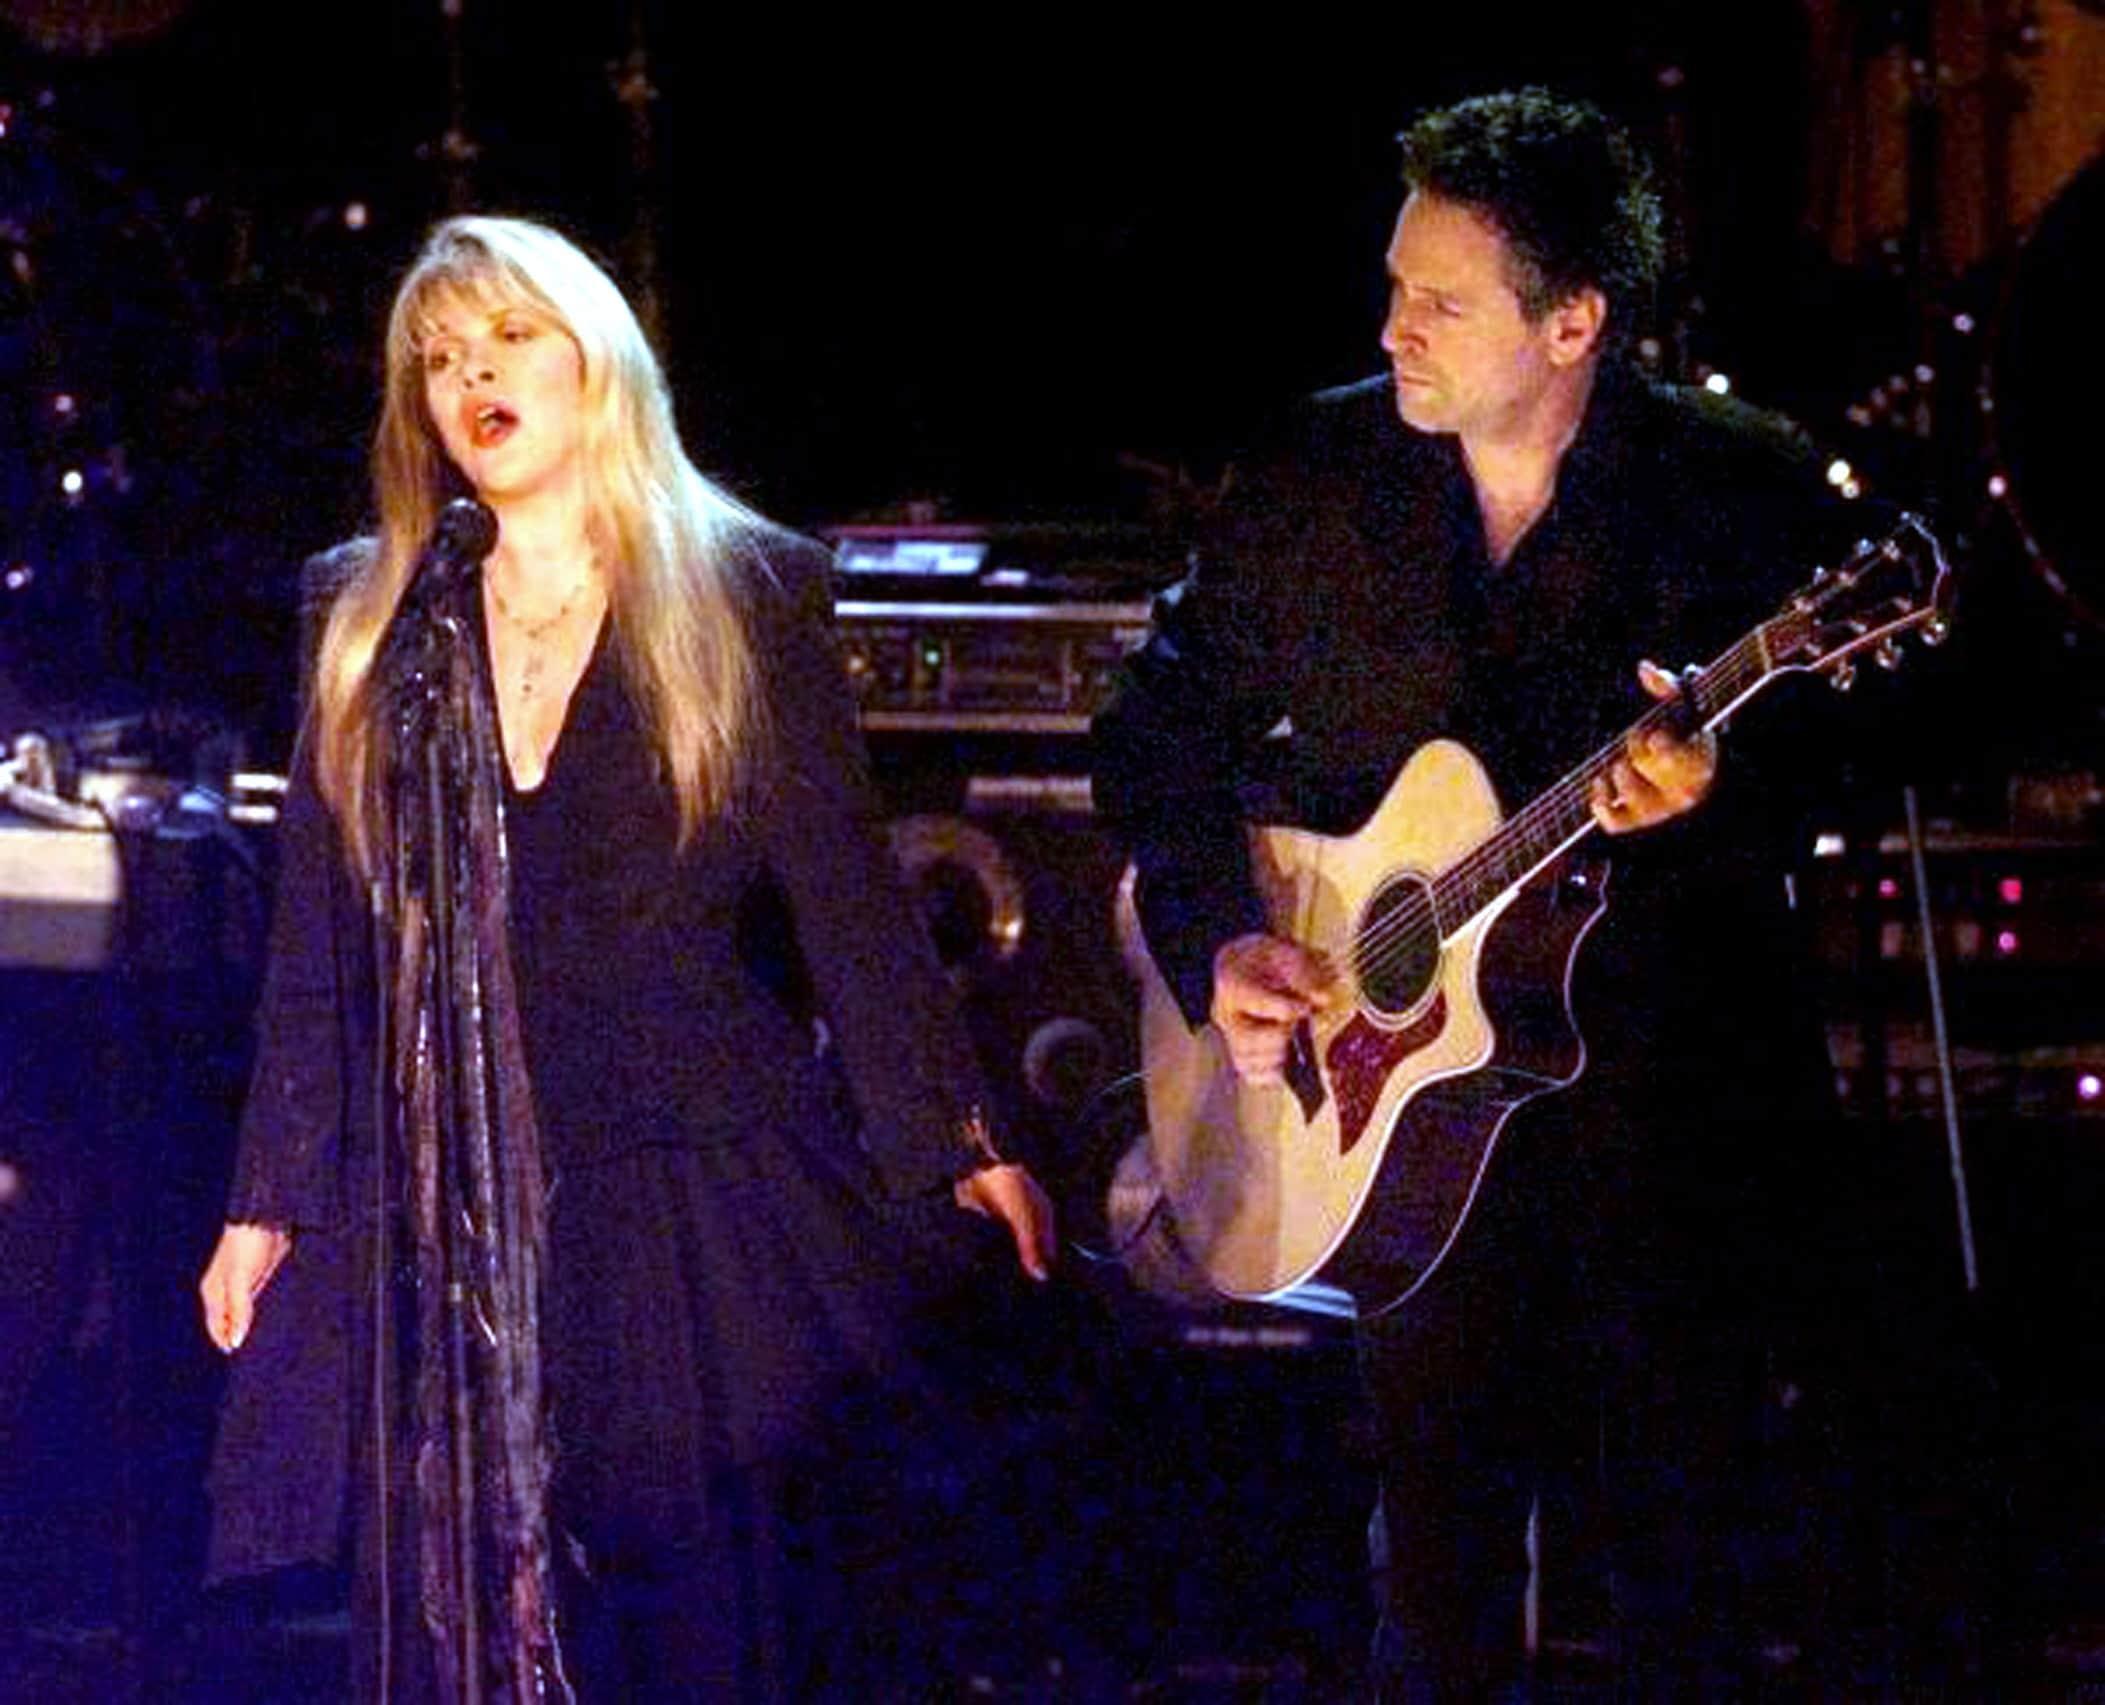 FLEETWOOD MAC, Stevie Nicks, Lindsey Buckingham, 2000's concert performance